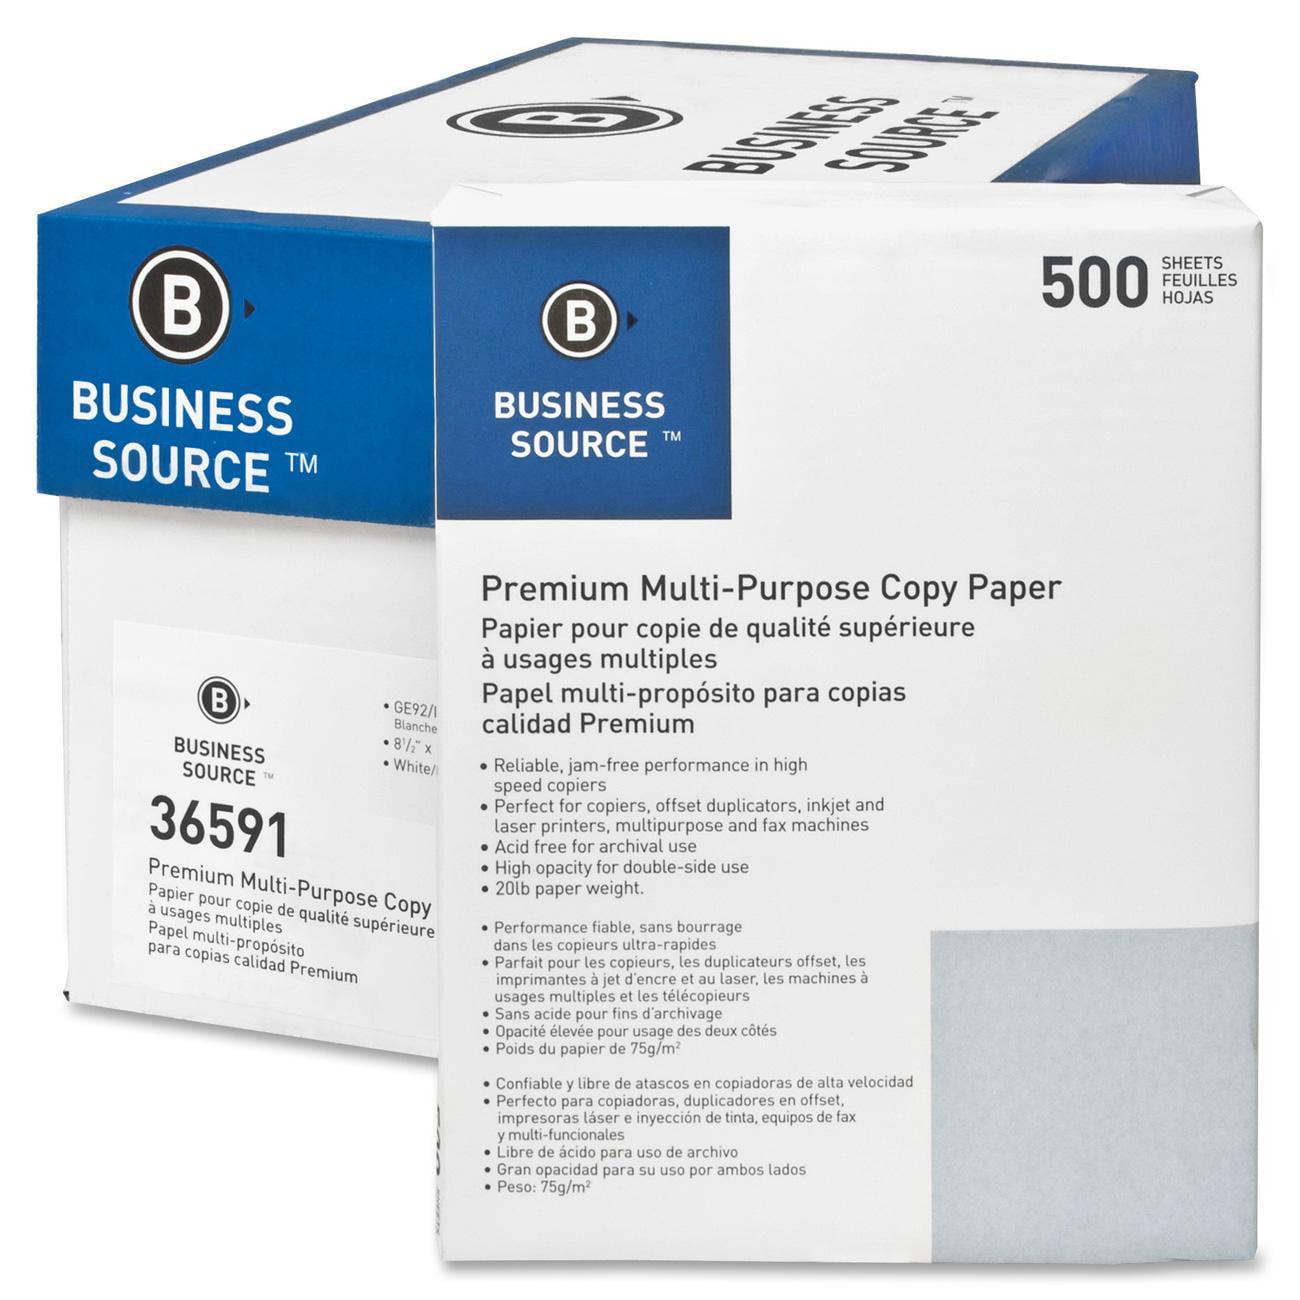 Business Source Premium Multipurpose Copy Paper, 92 Bright, 20lb, 10 Reams, 5000 SHeets carton, White by Business Source